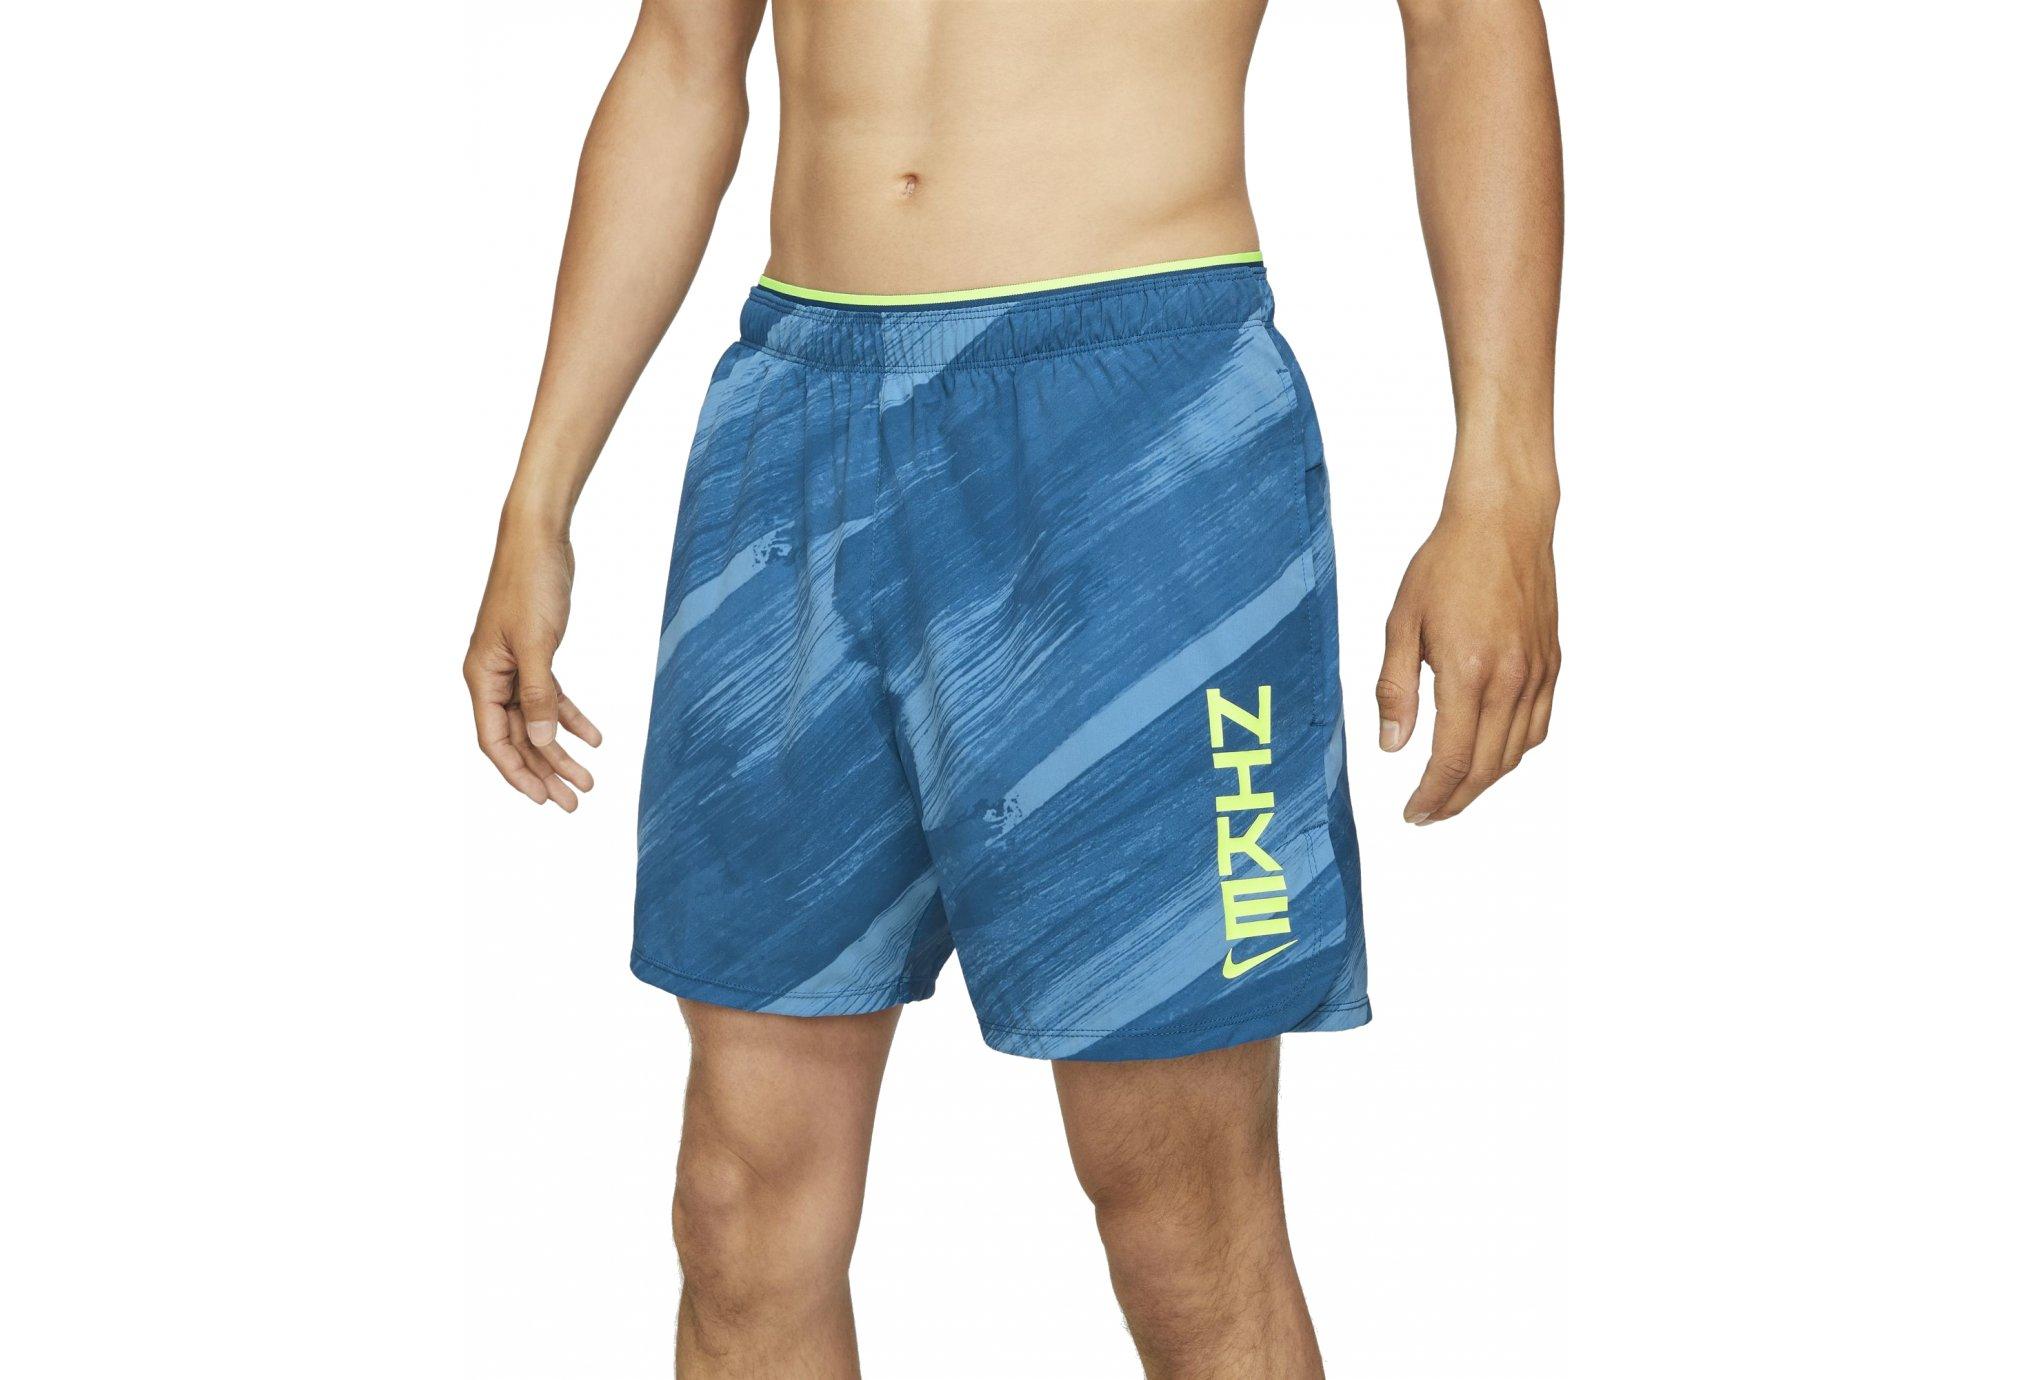 Nike Sport Clash Woven M vêtement running homme